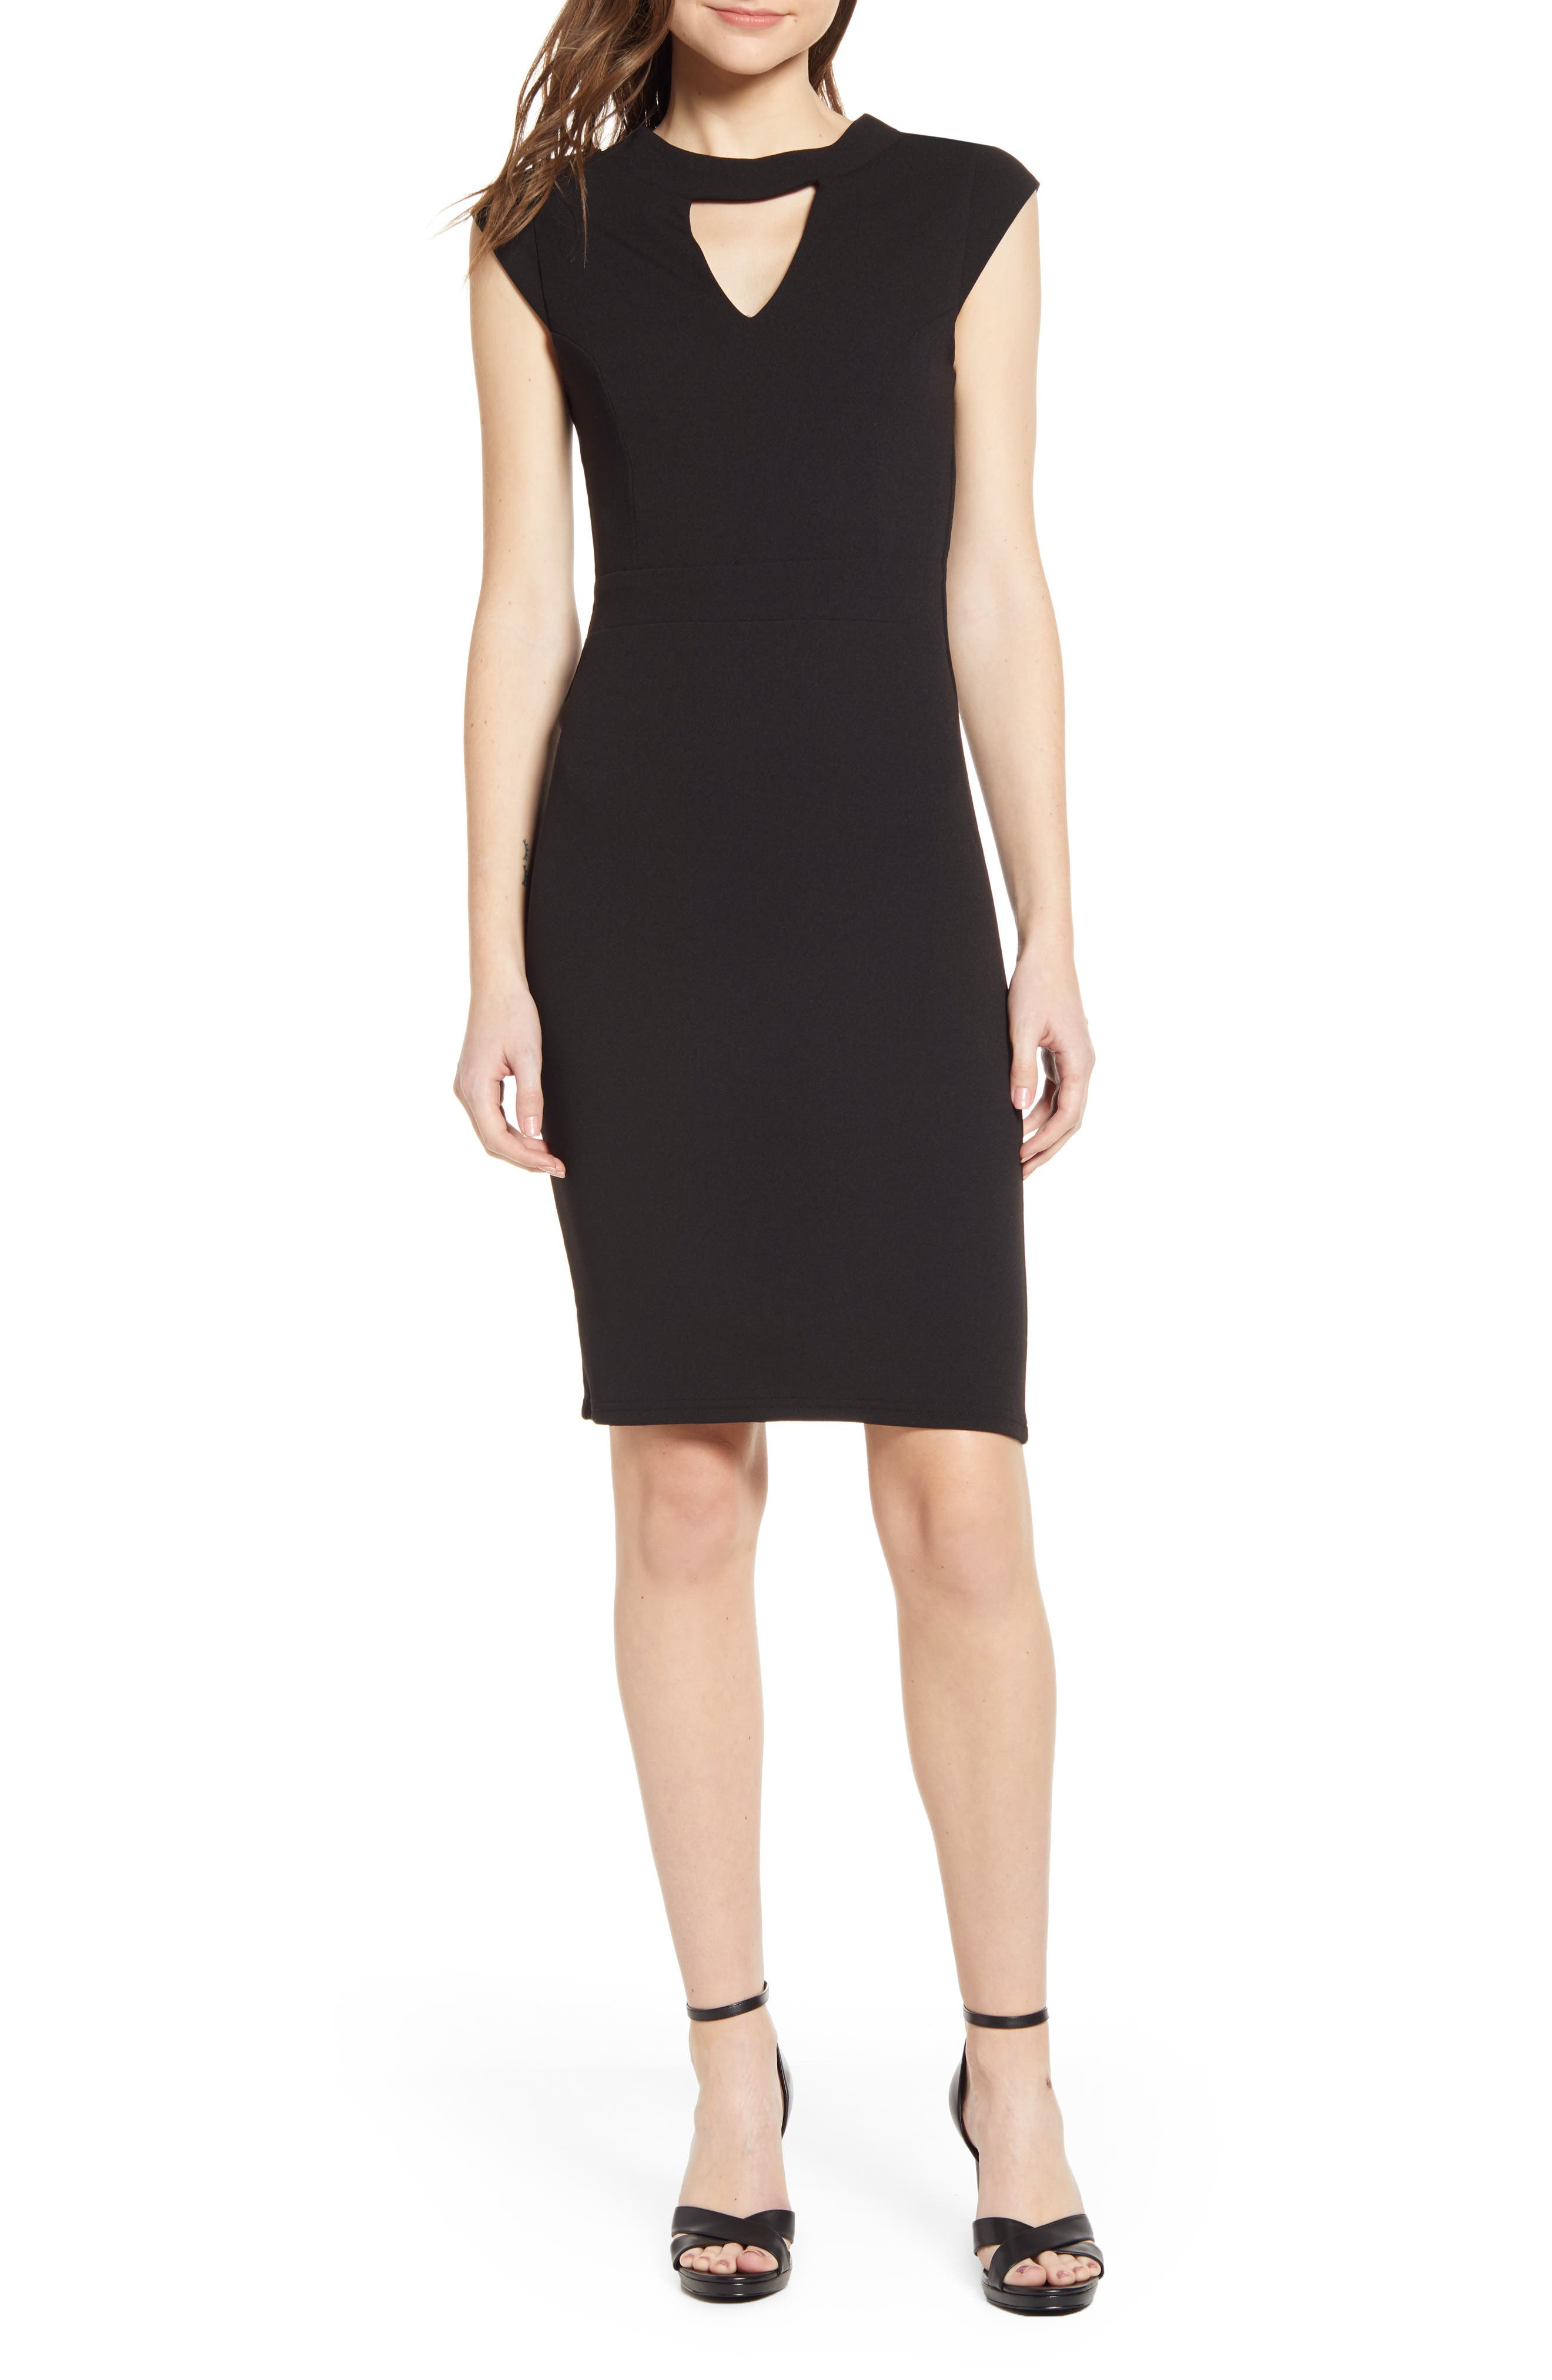 Sentimental Ny Victorious Keyhole Body-Con Dress, Black